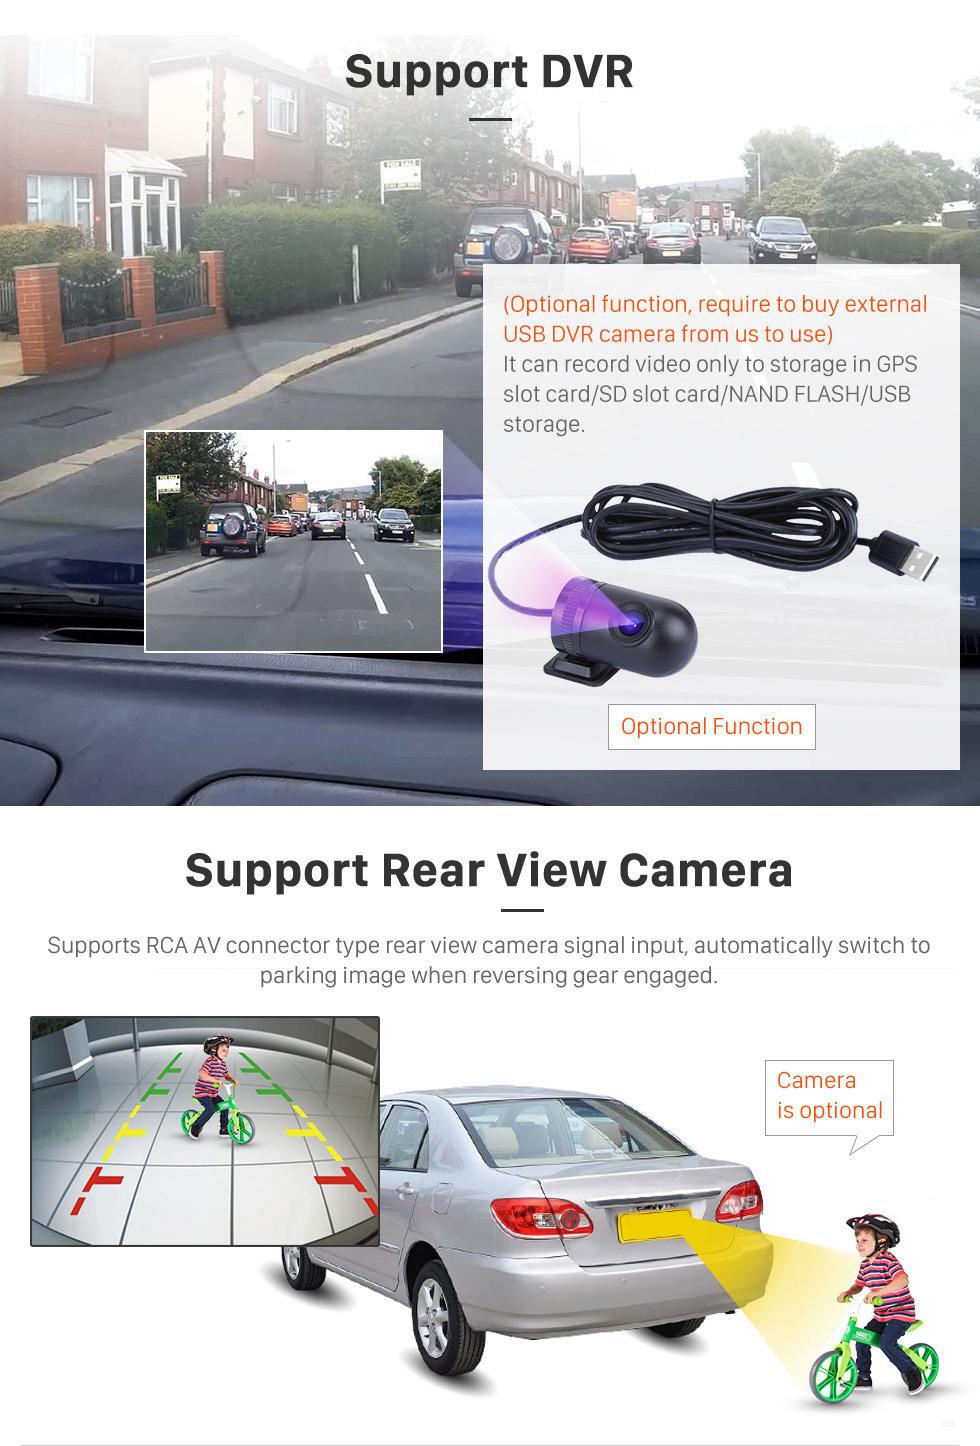 Seicane 9 inch 2012-2015 VW Volkswagen Santana Android 10.0 Radio GPS Navigation System Support 3G/4G WiFi Rear View Camera Backup Camera Mirror Link Bluetooth DVR